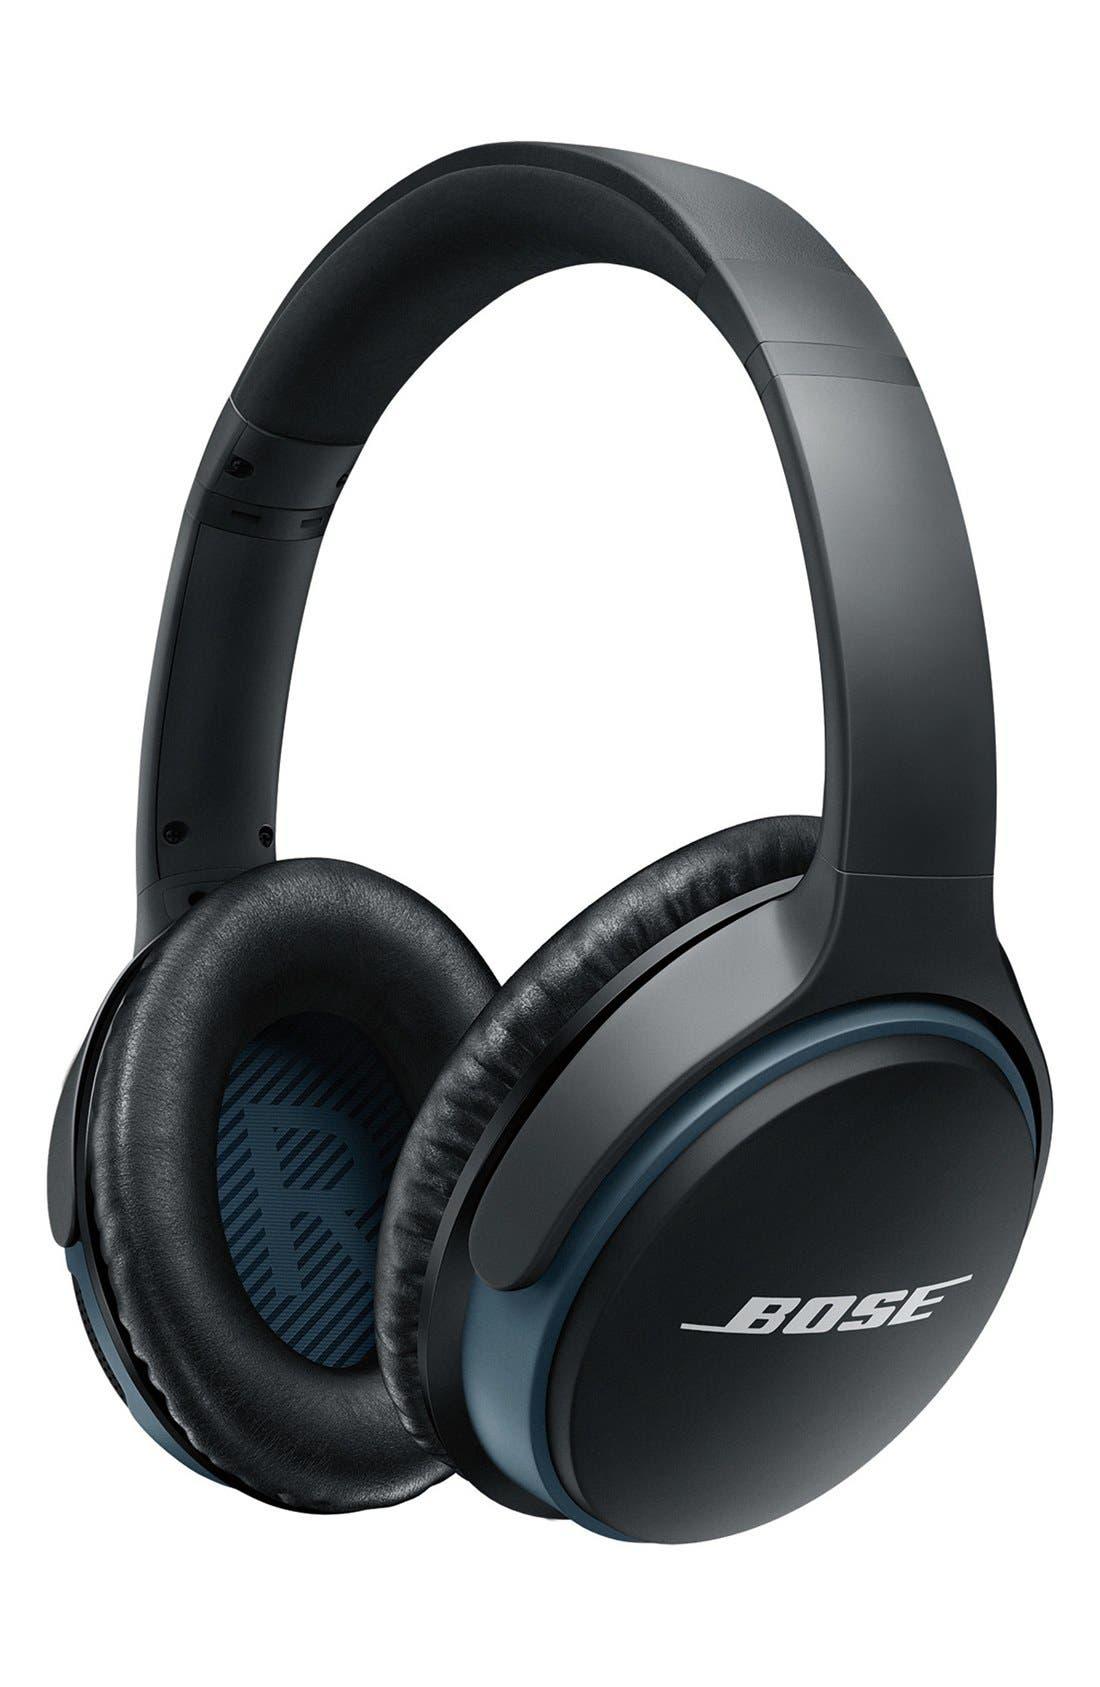 Main Image - Bose® SoundLink® Around-Ear Bluetooth® Headphones